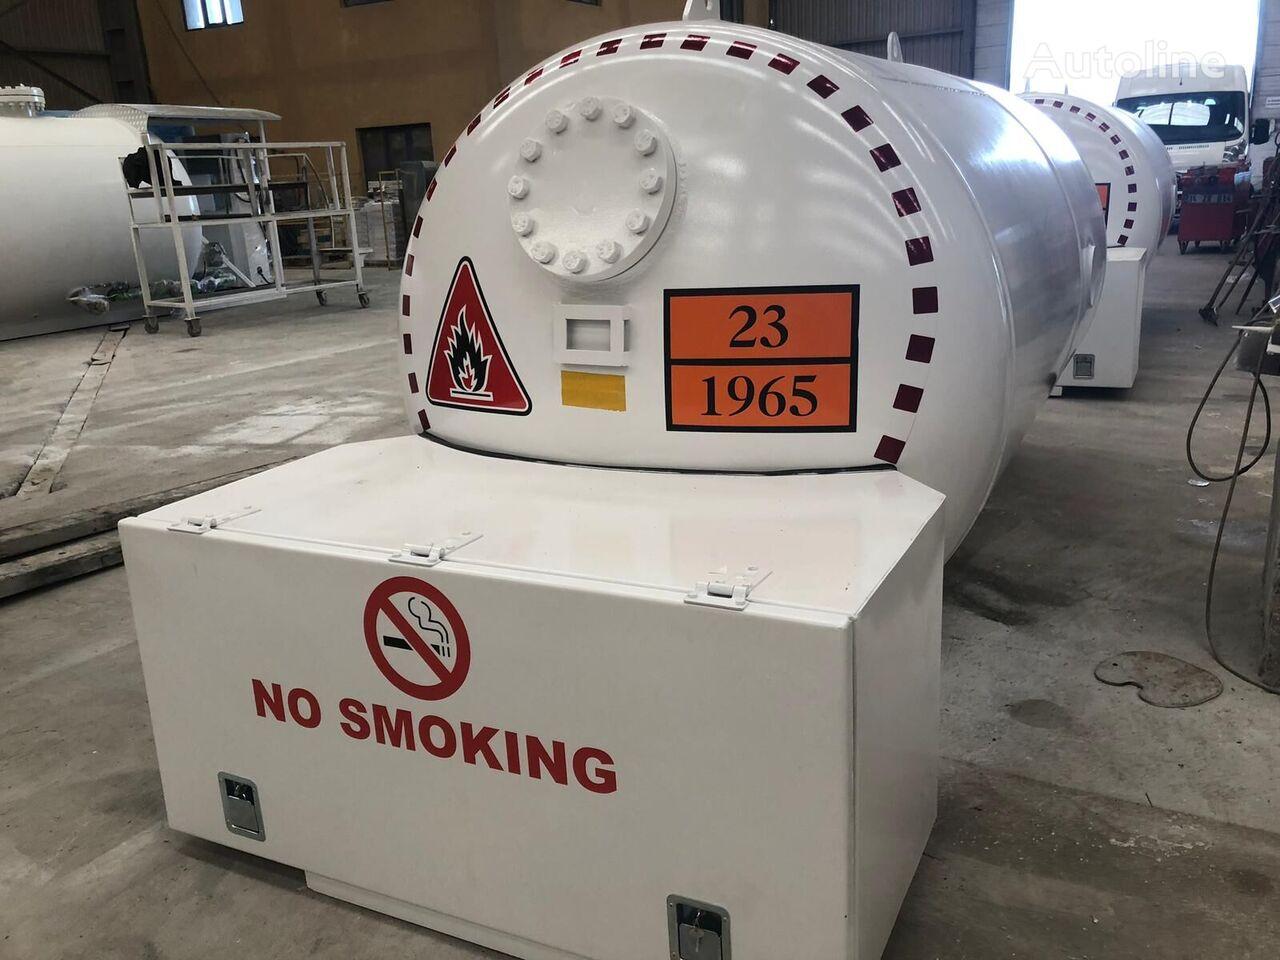 naujas dujų cisterna Micansan bobtaıl tank 4-8-10 m3 for domestıc usıng